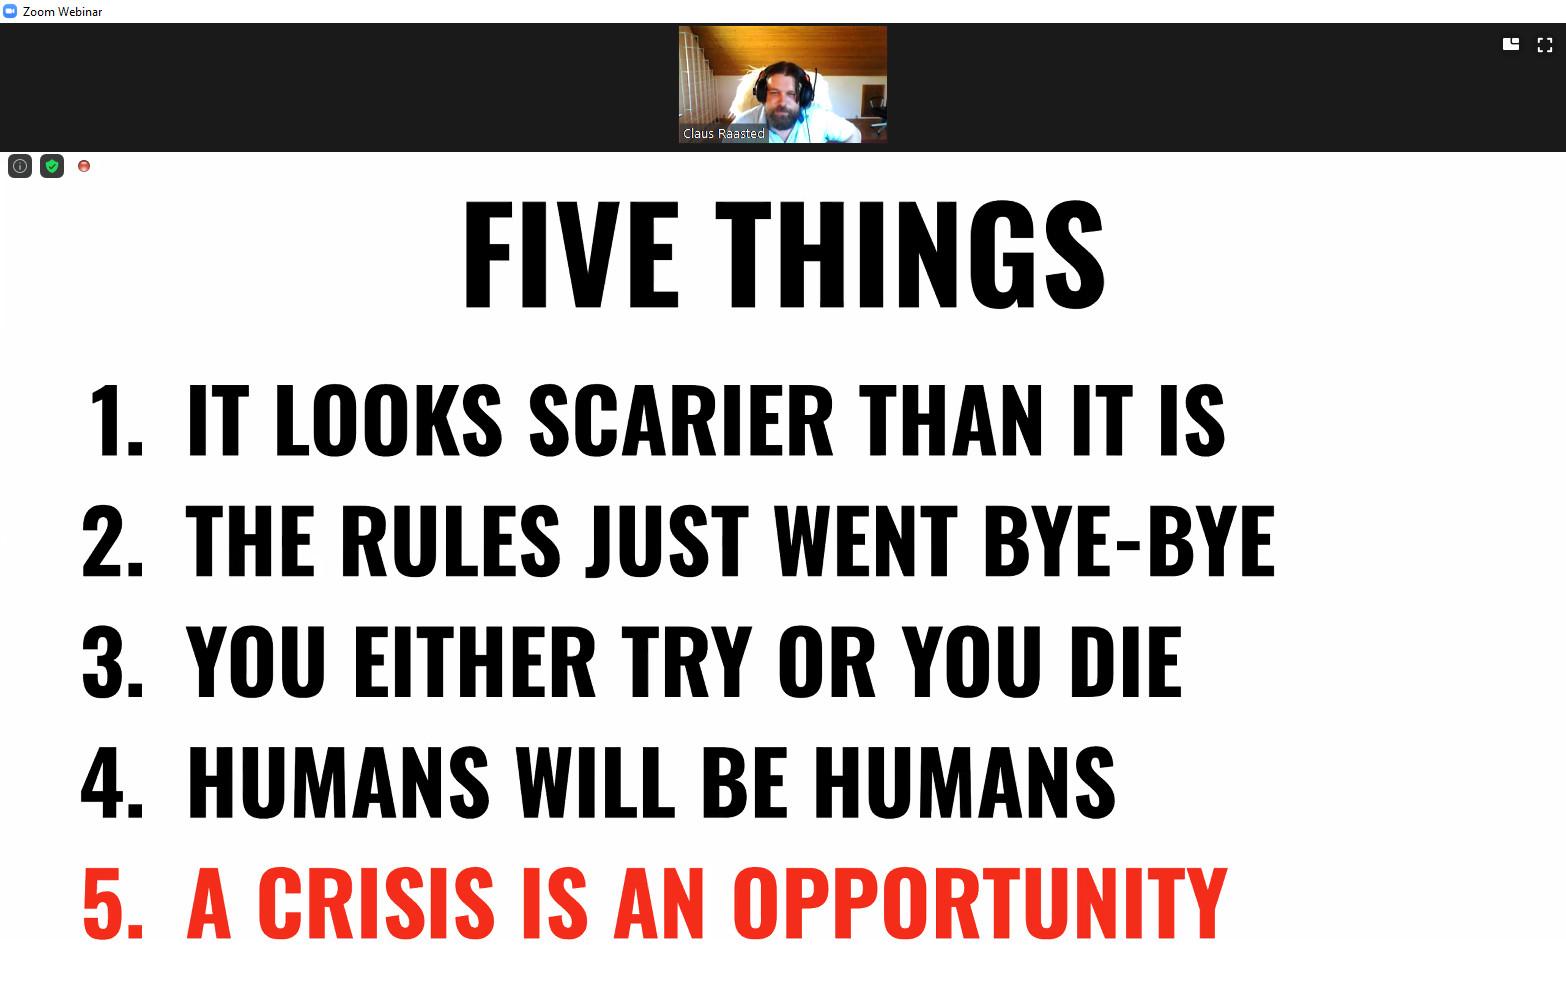 Claus Rasteed - Five Things